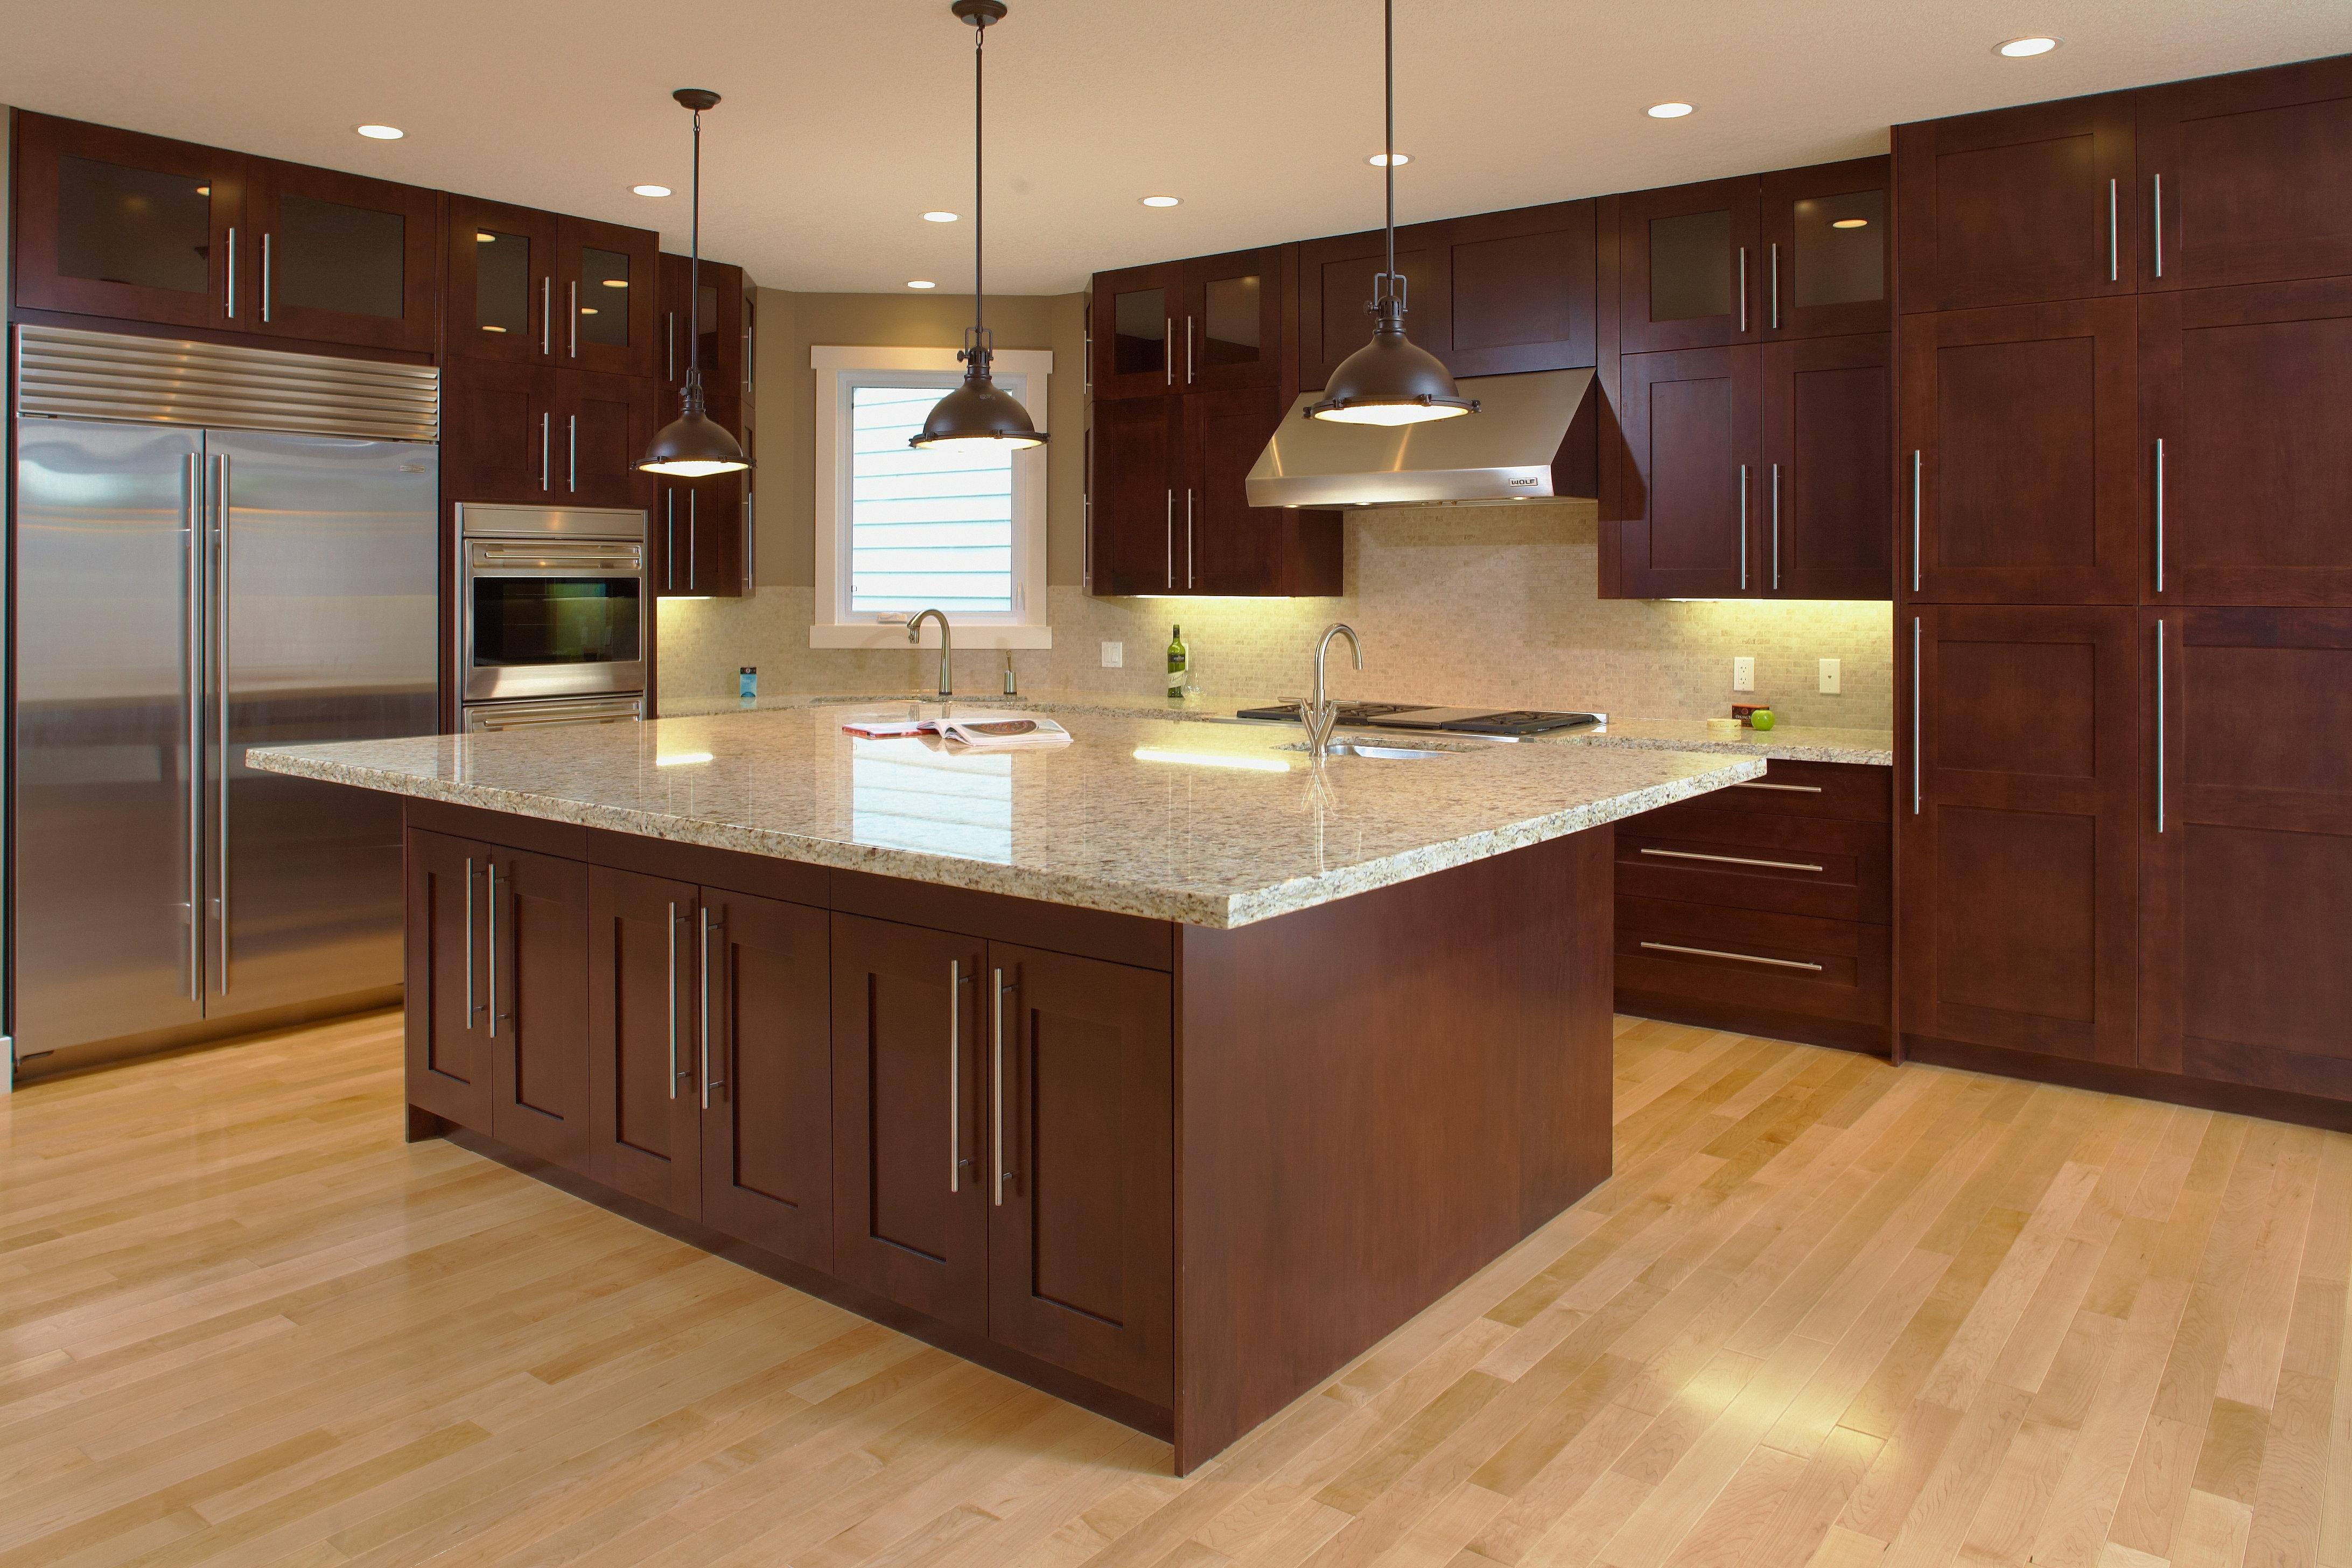 modern kitchen cabinets with Gallery on House In Canada additionally Cool Kitchen Design further Italian Kitchen Design moreover Extreme Garage Makeover Ideas as well Mutfak Dolaplari Modelleri.